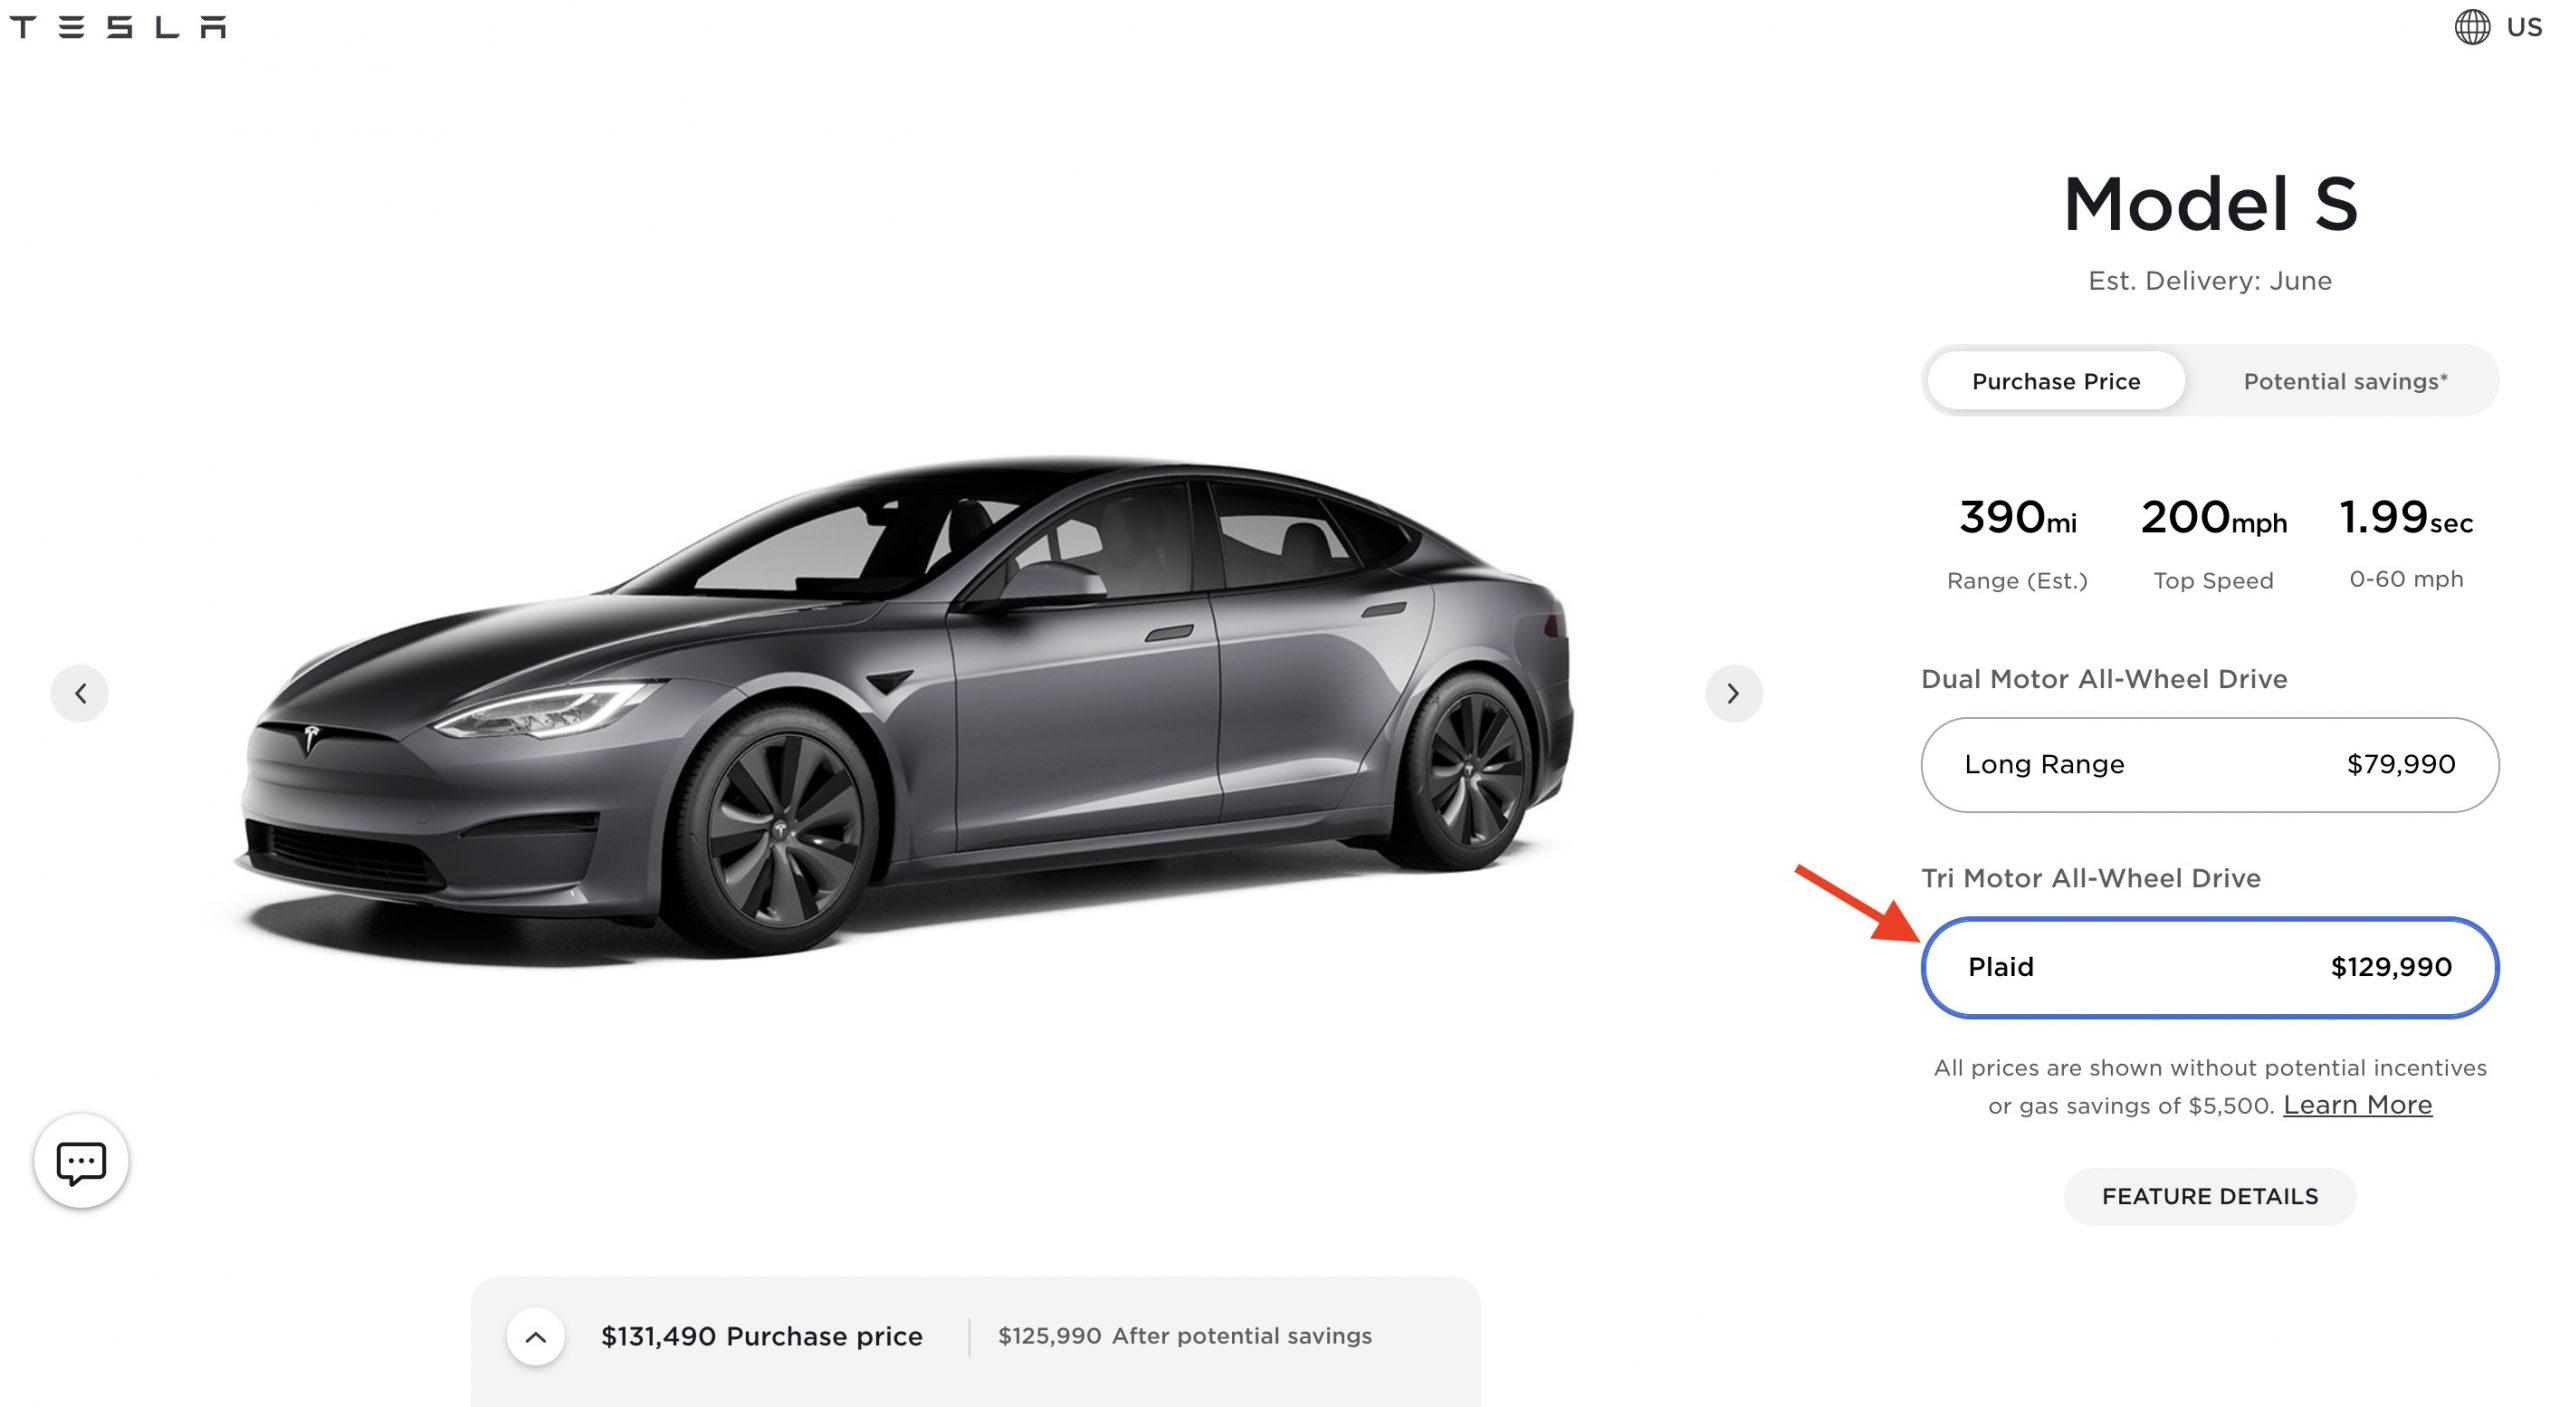 model-s-plaid-price-increase